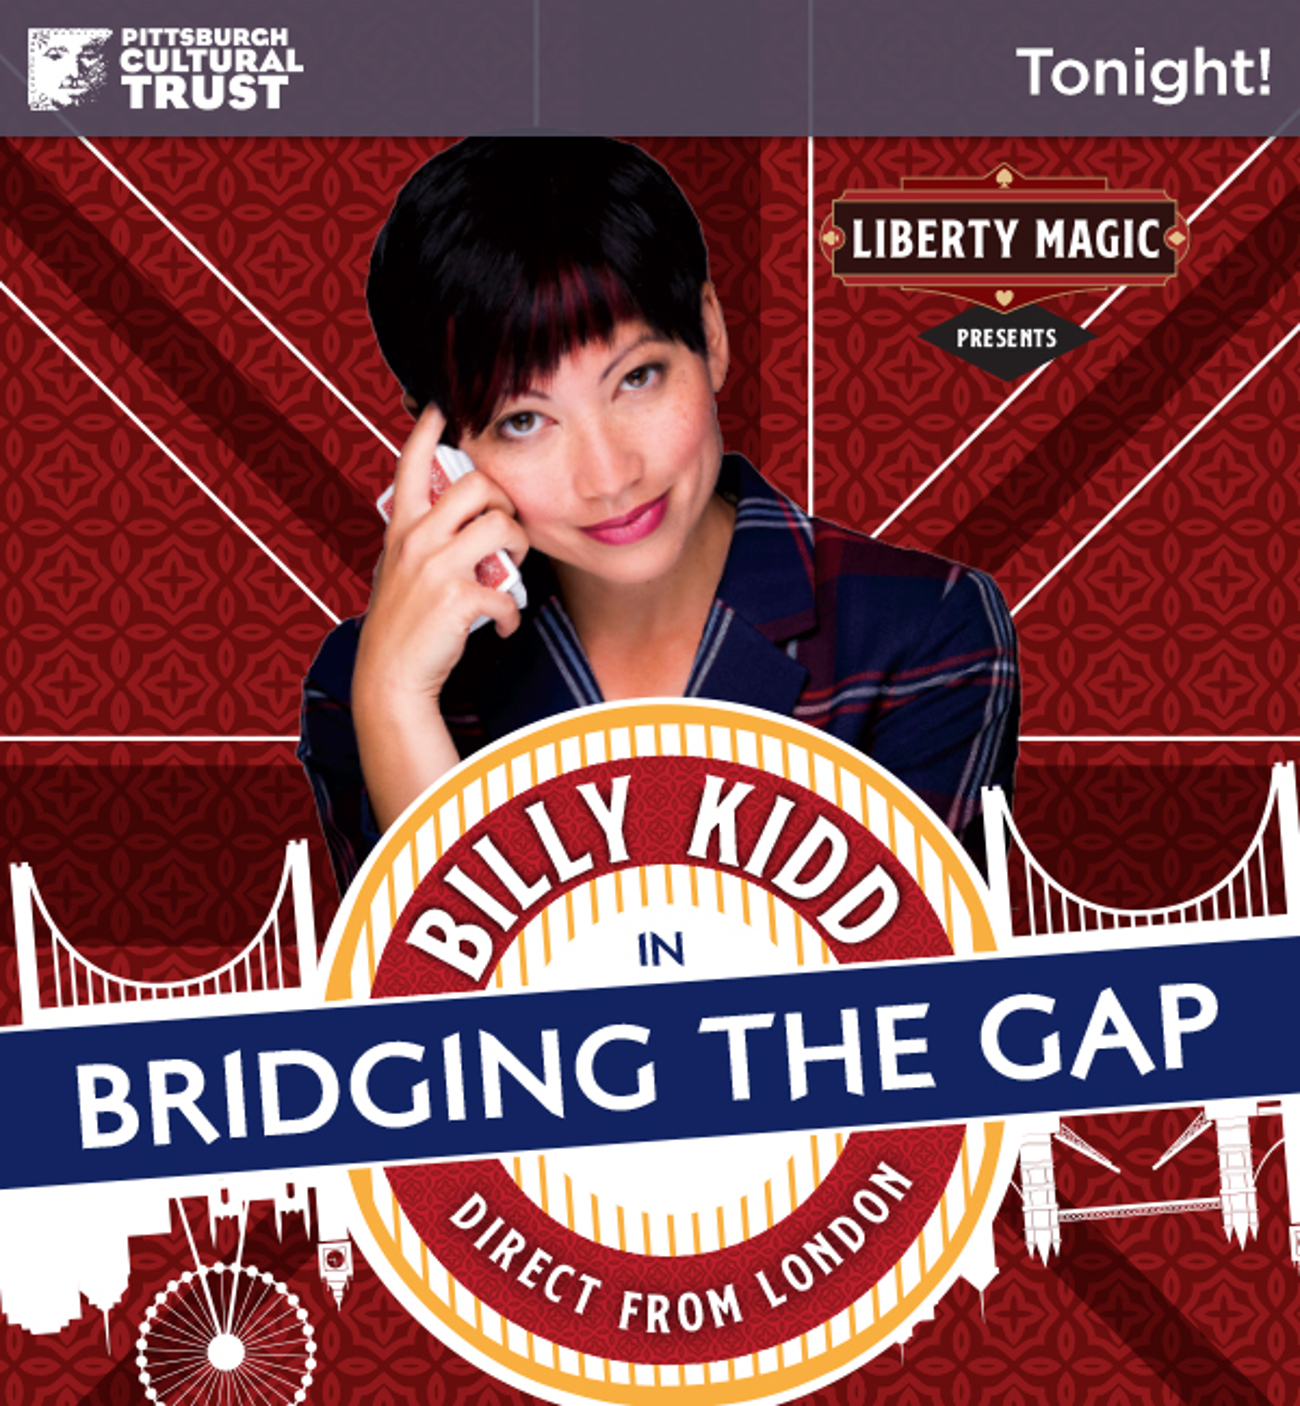 BWW Review: BILLY KIDD: BRIDGING THE GAP Fuses Magic, Comedy, Surrealism at Liberty Magic